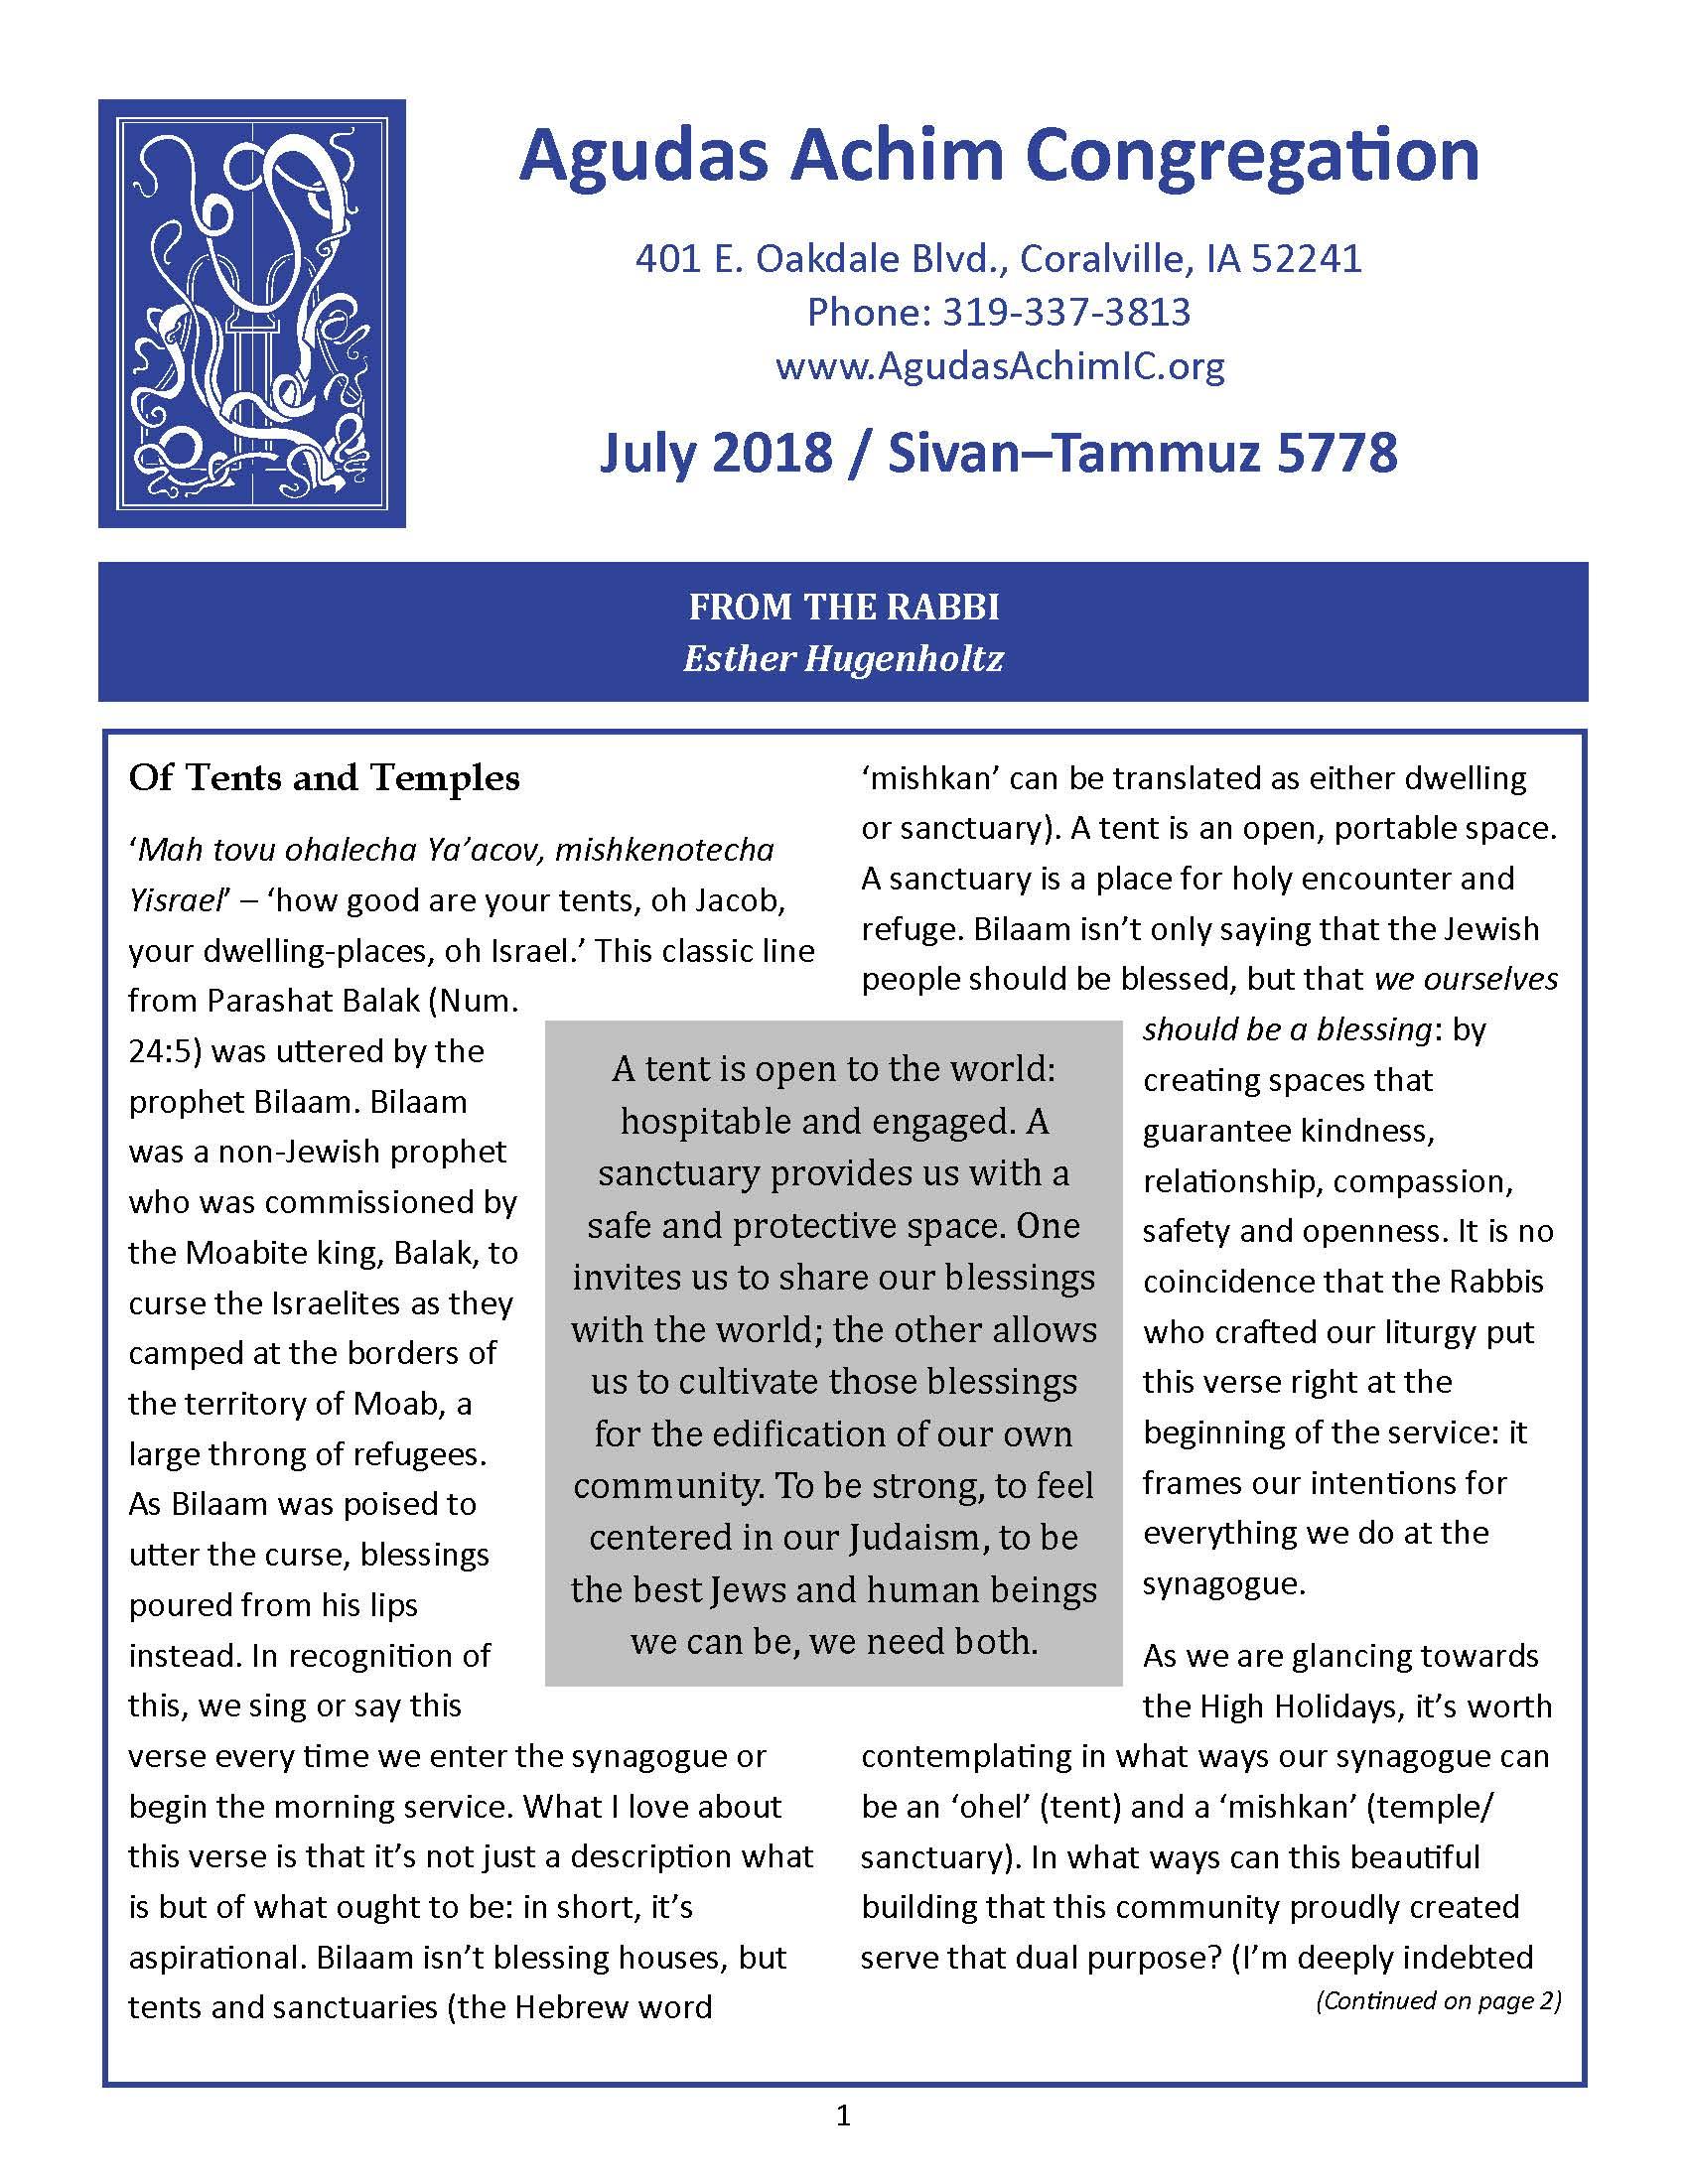 July 2018 Bulletin